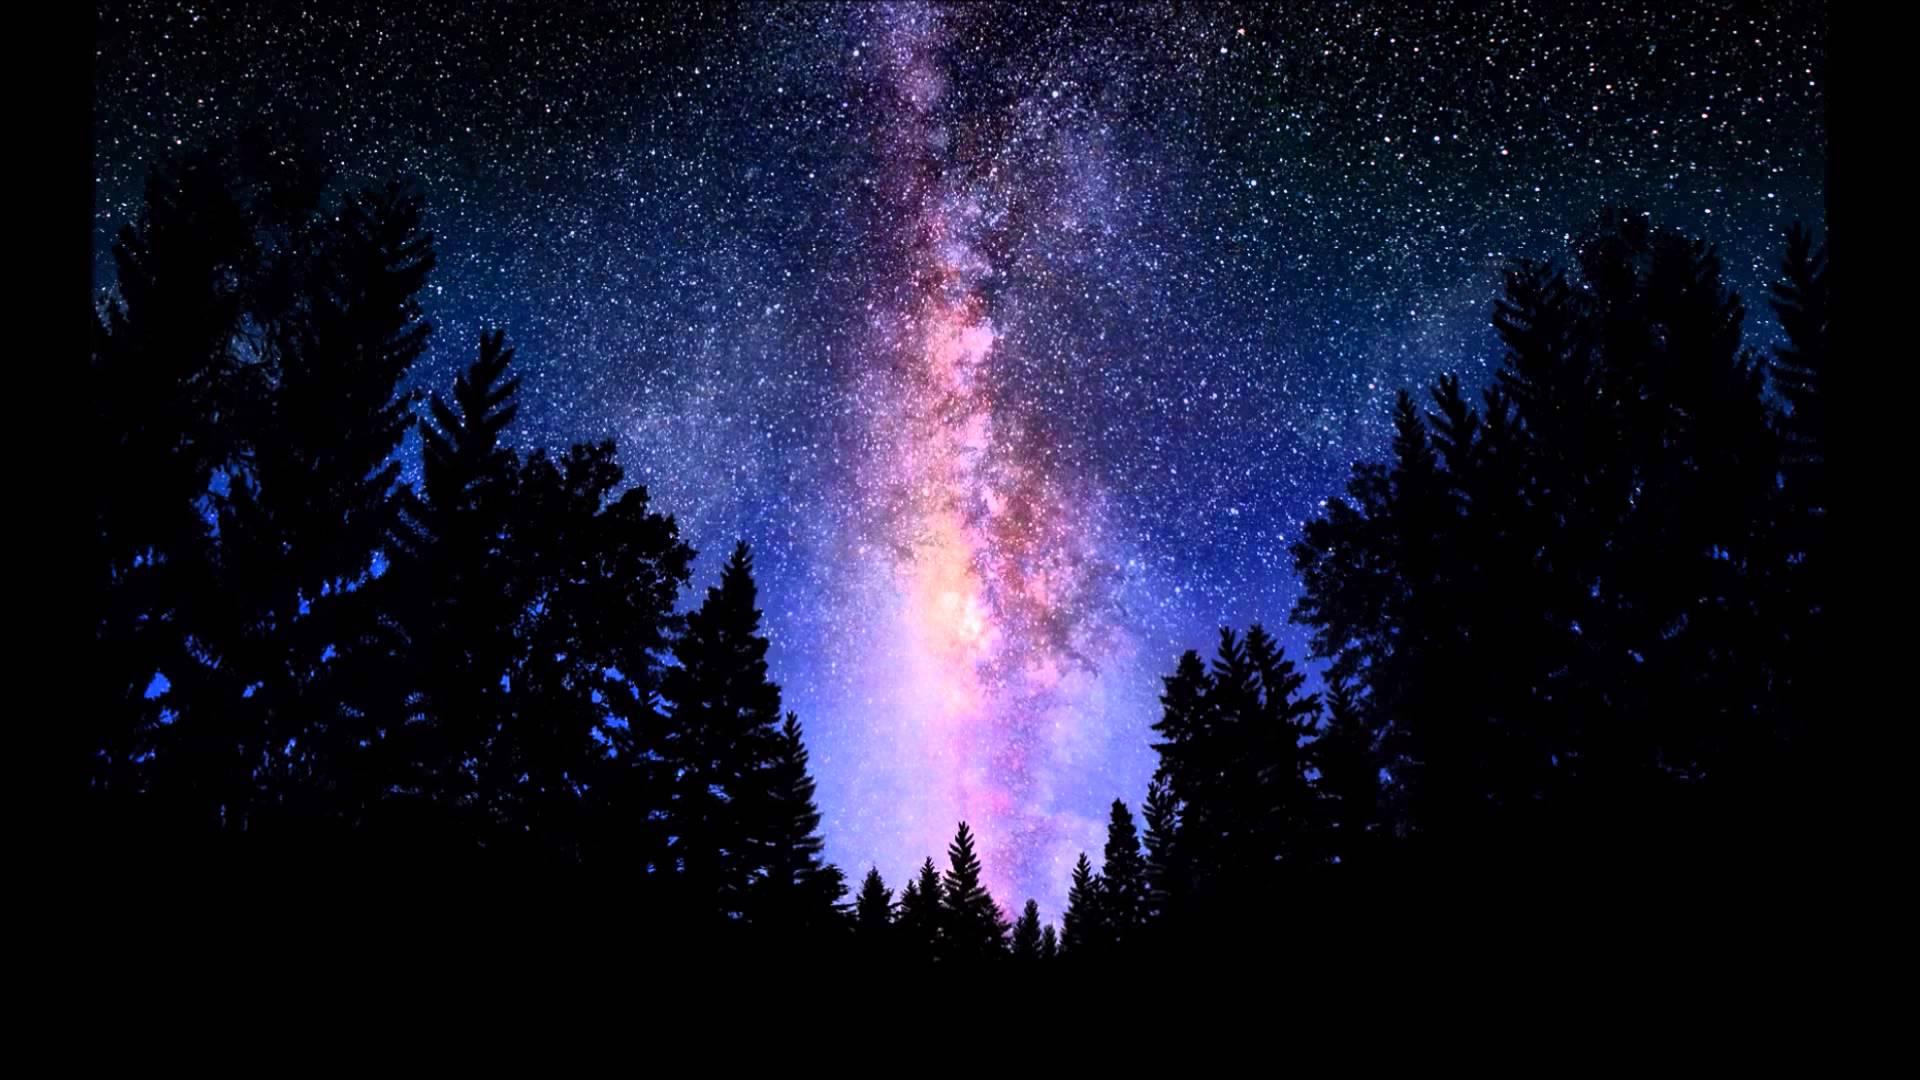 An In-depth look at the Fermi Paradox by Tim Urban